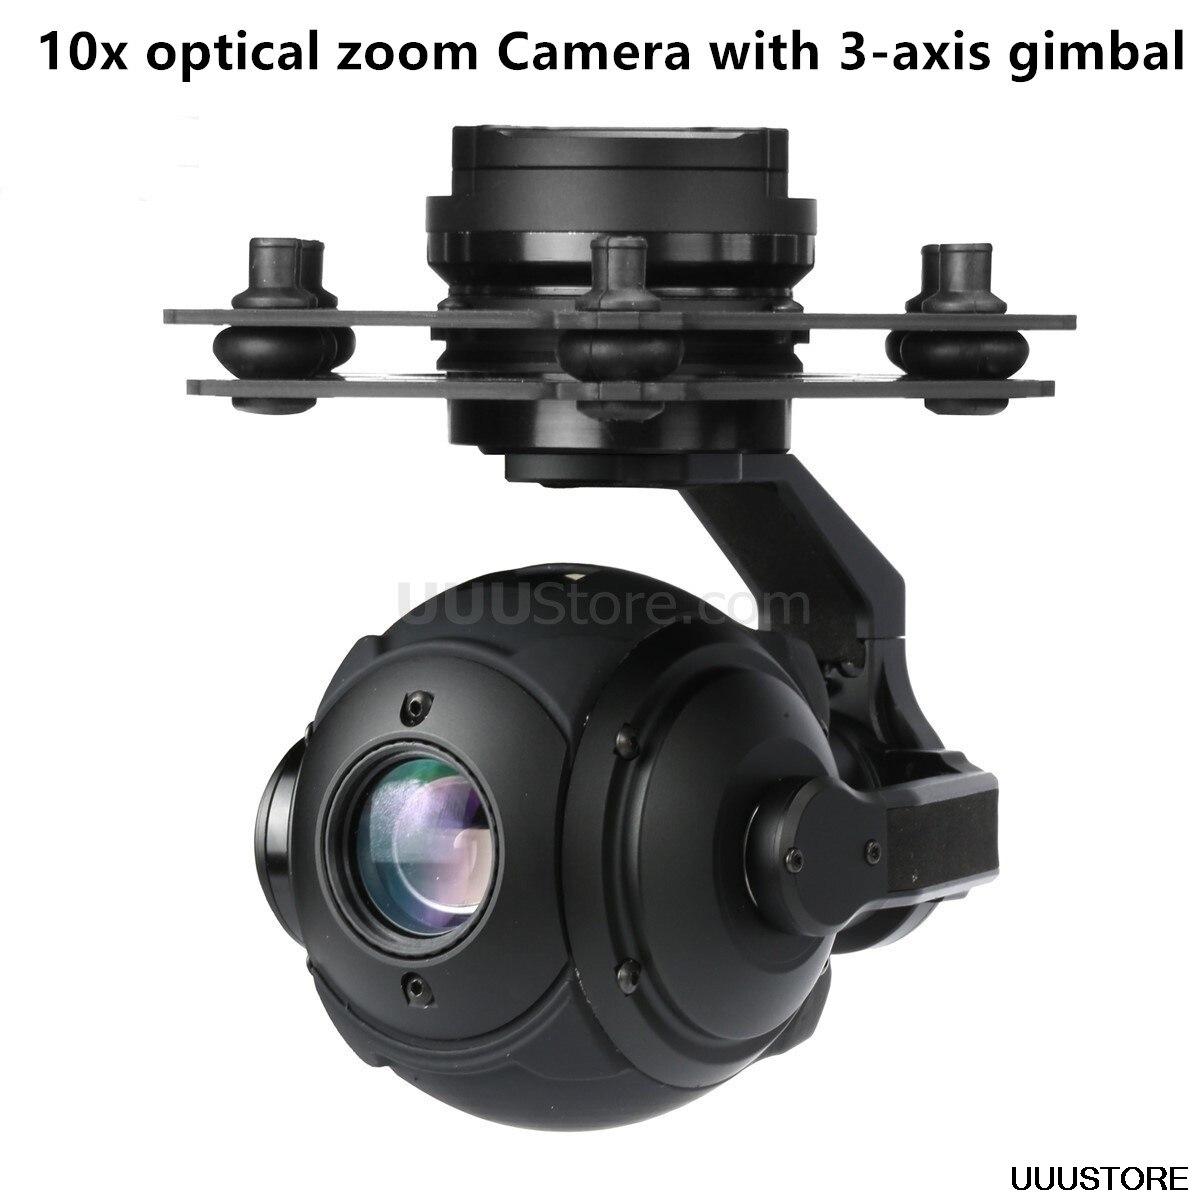 T10X-Pro FPV esférico 10x zoom óptico 1/3 CMOS cámara con actualización de cardán de 3 ejes de Tarot PEEPER T10X para FPV RC quadcopter